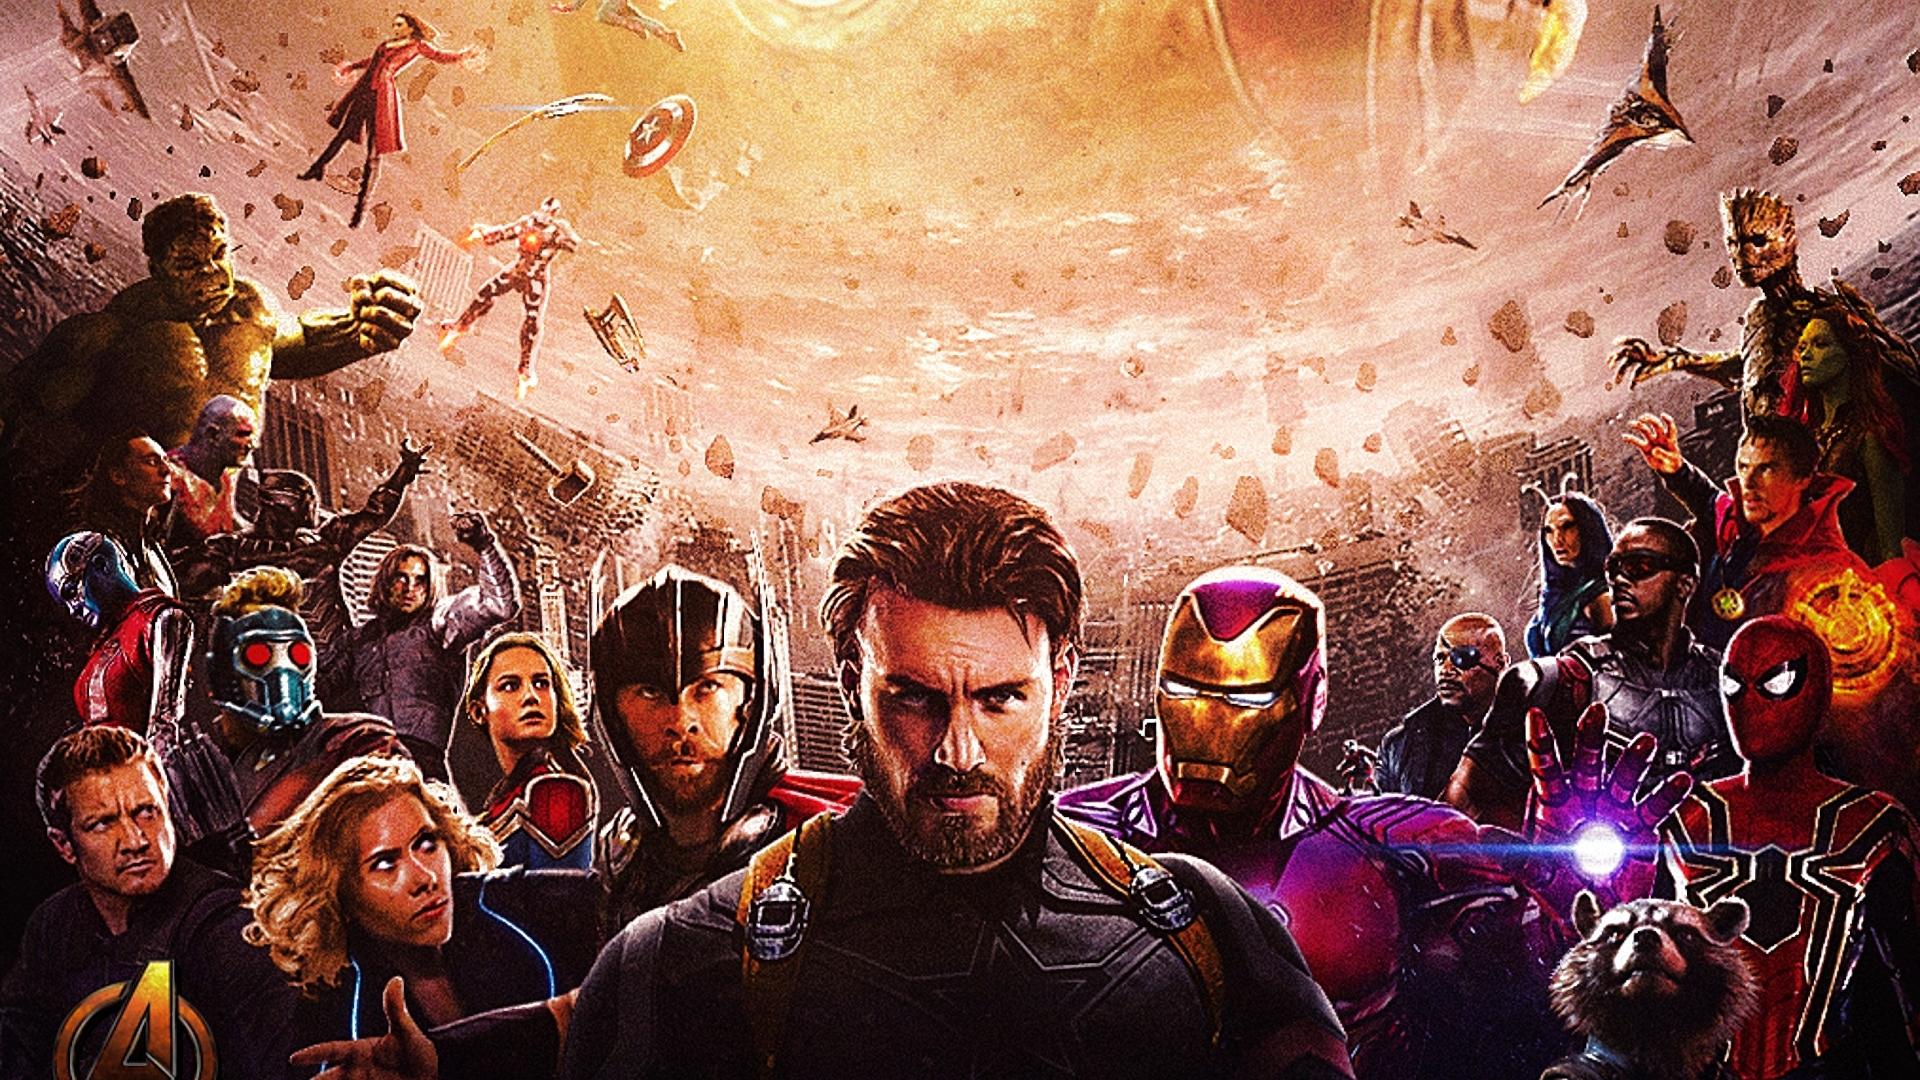 4k Avengers infinity war 2018